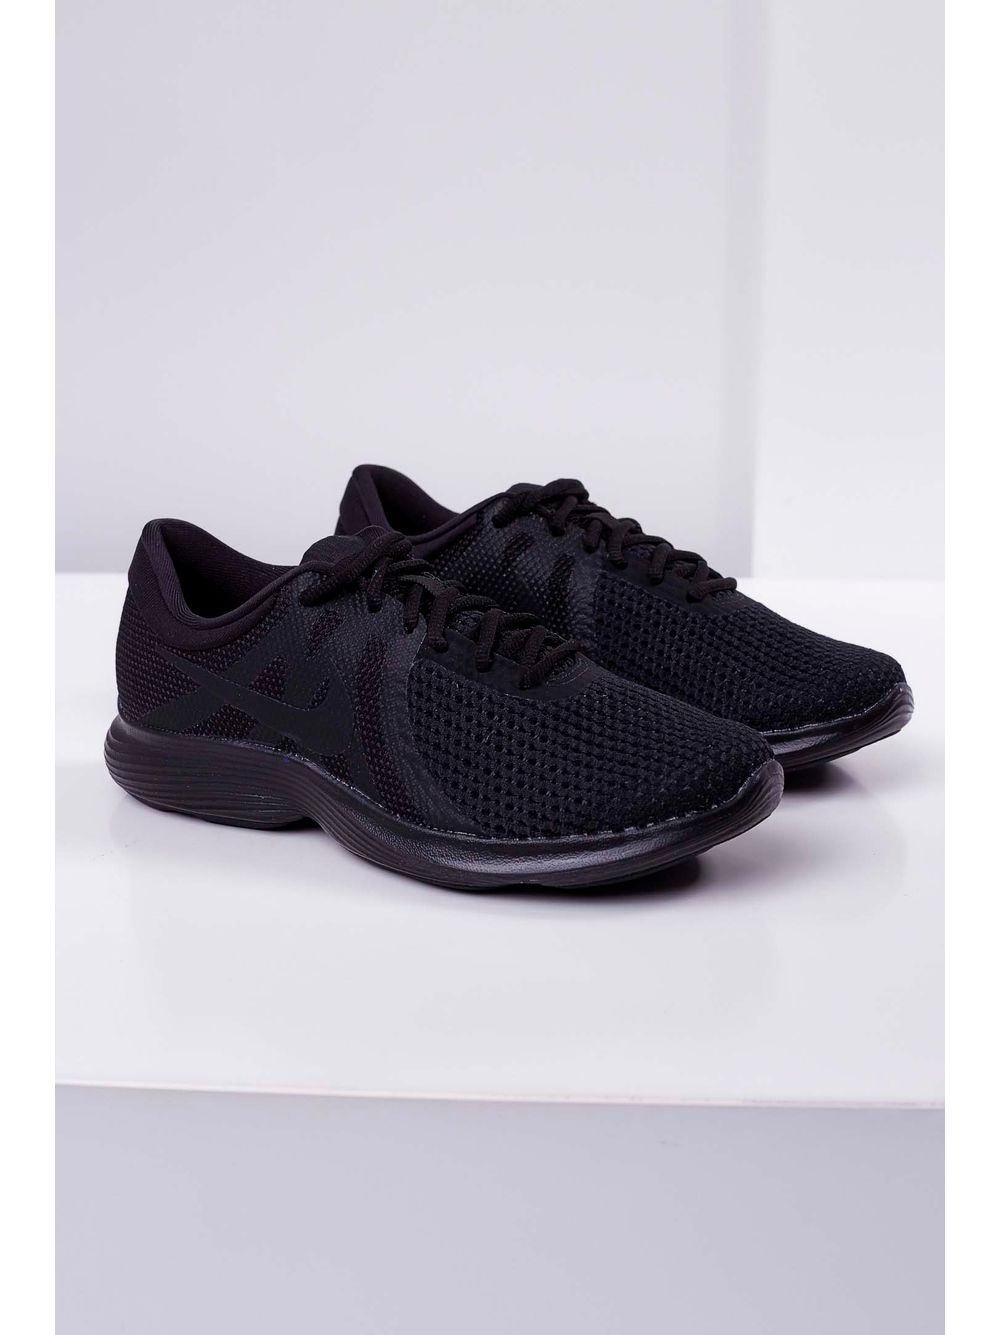 Tênis Corrida Nike Revolution 4 Preto - pittol fa30e69ebd393